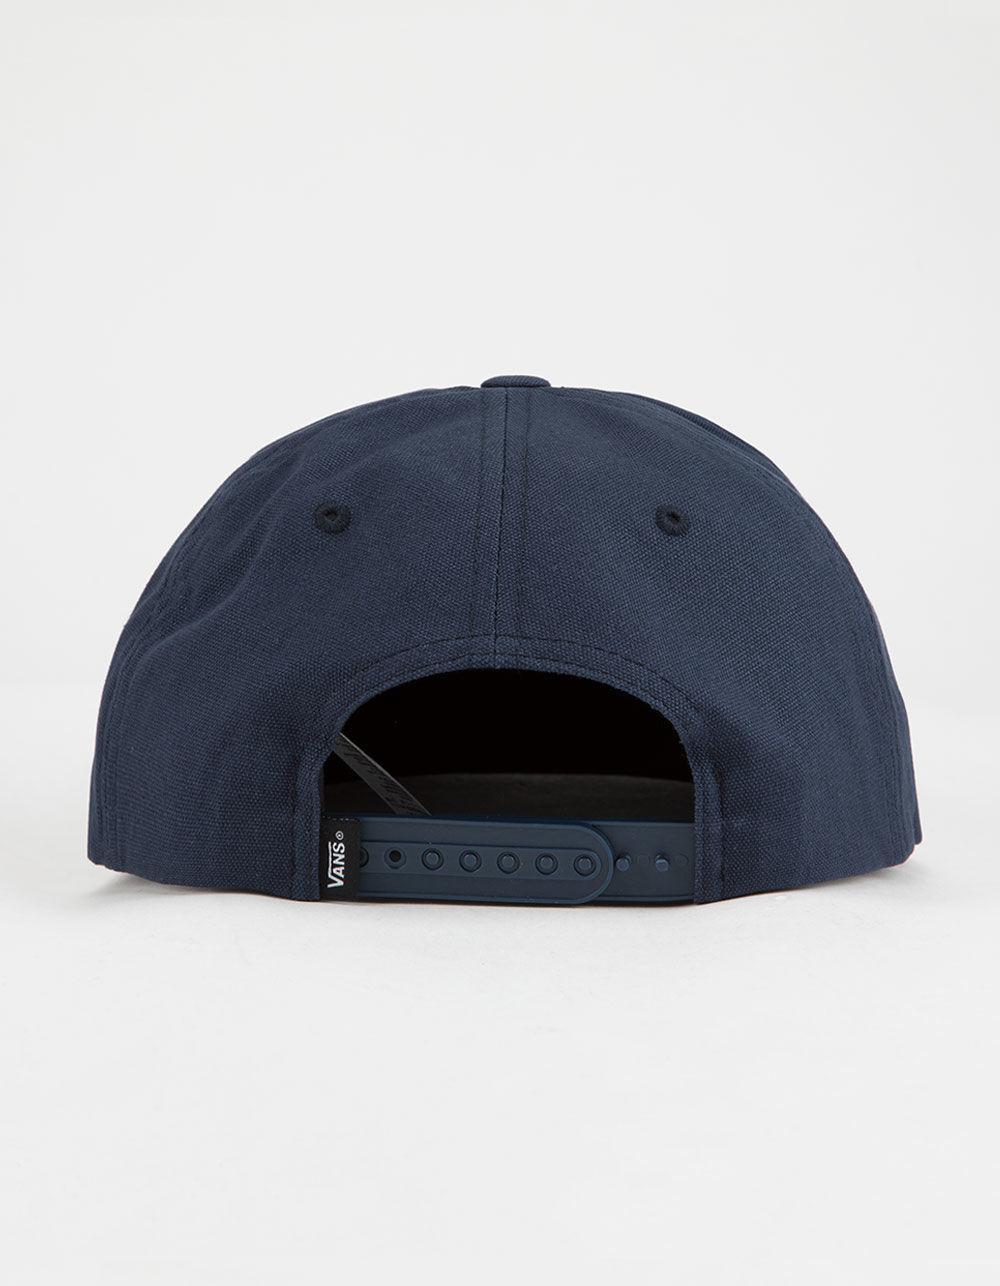 Lyst - Vans Fiske Navy Mens Snapback Hat in Blue for Men 0b6dea13a